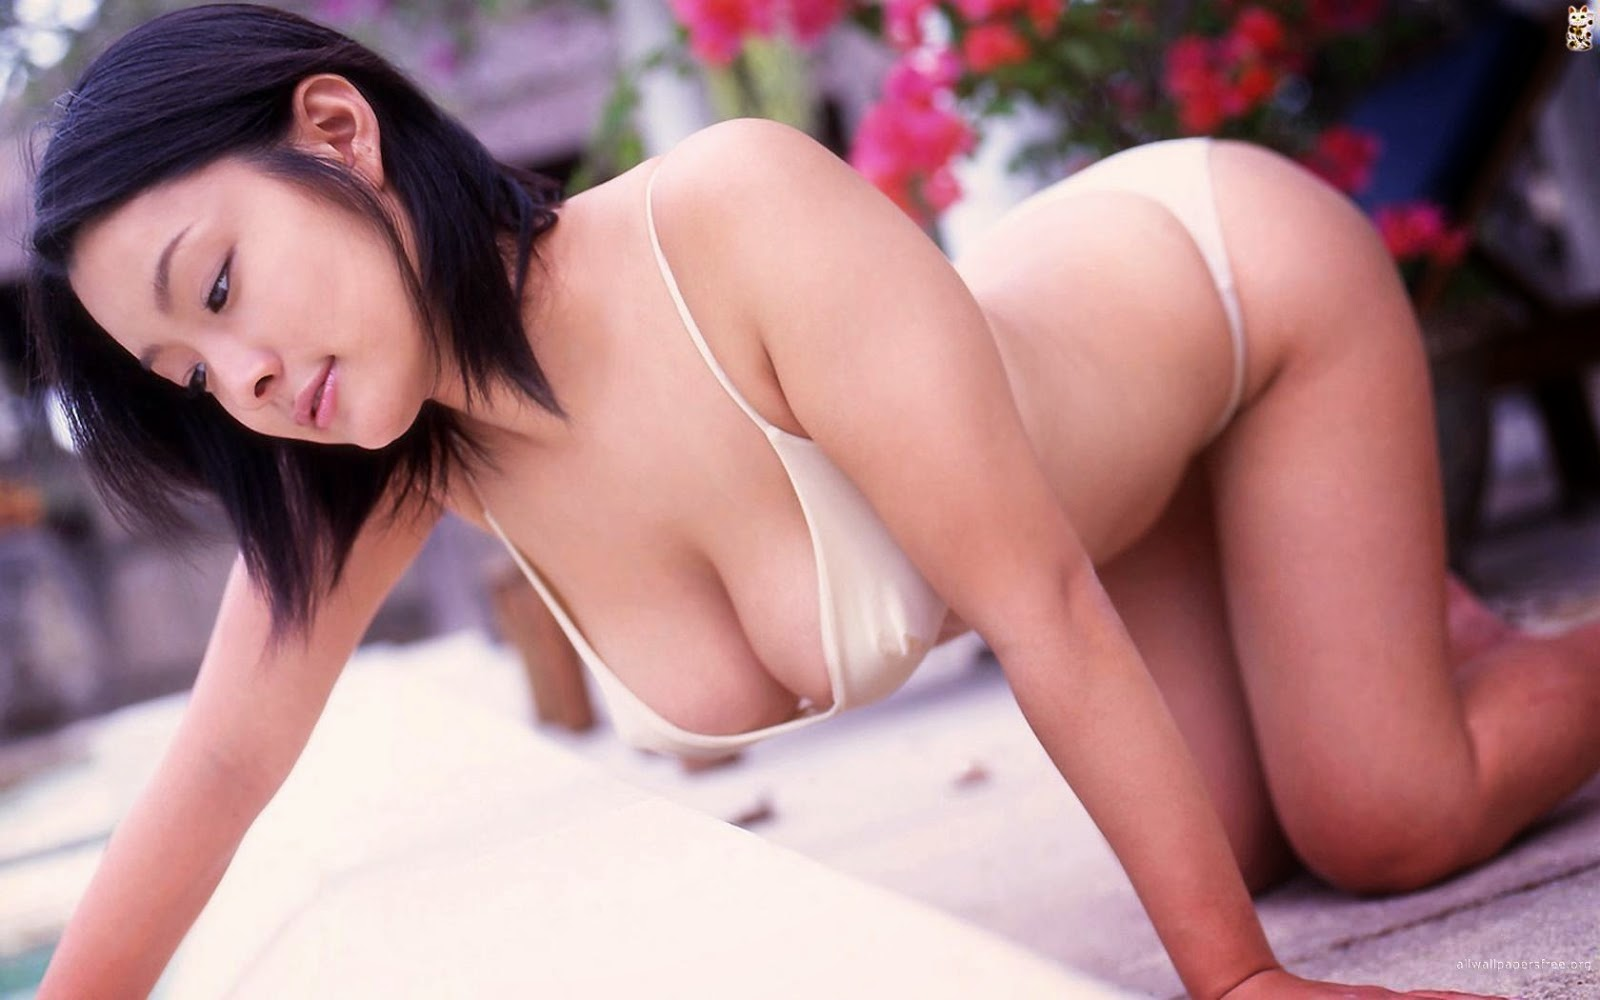 Hd Hot And Bold Girl - Beautifull Girls Image-9432